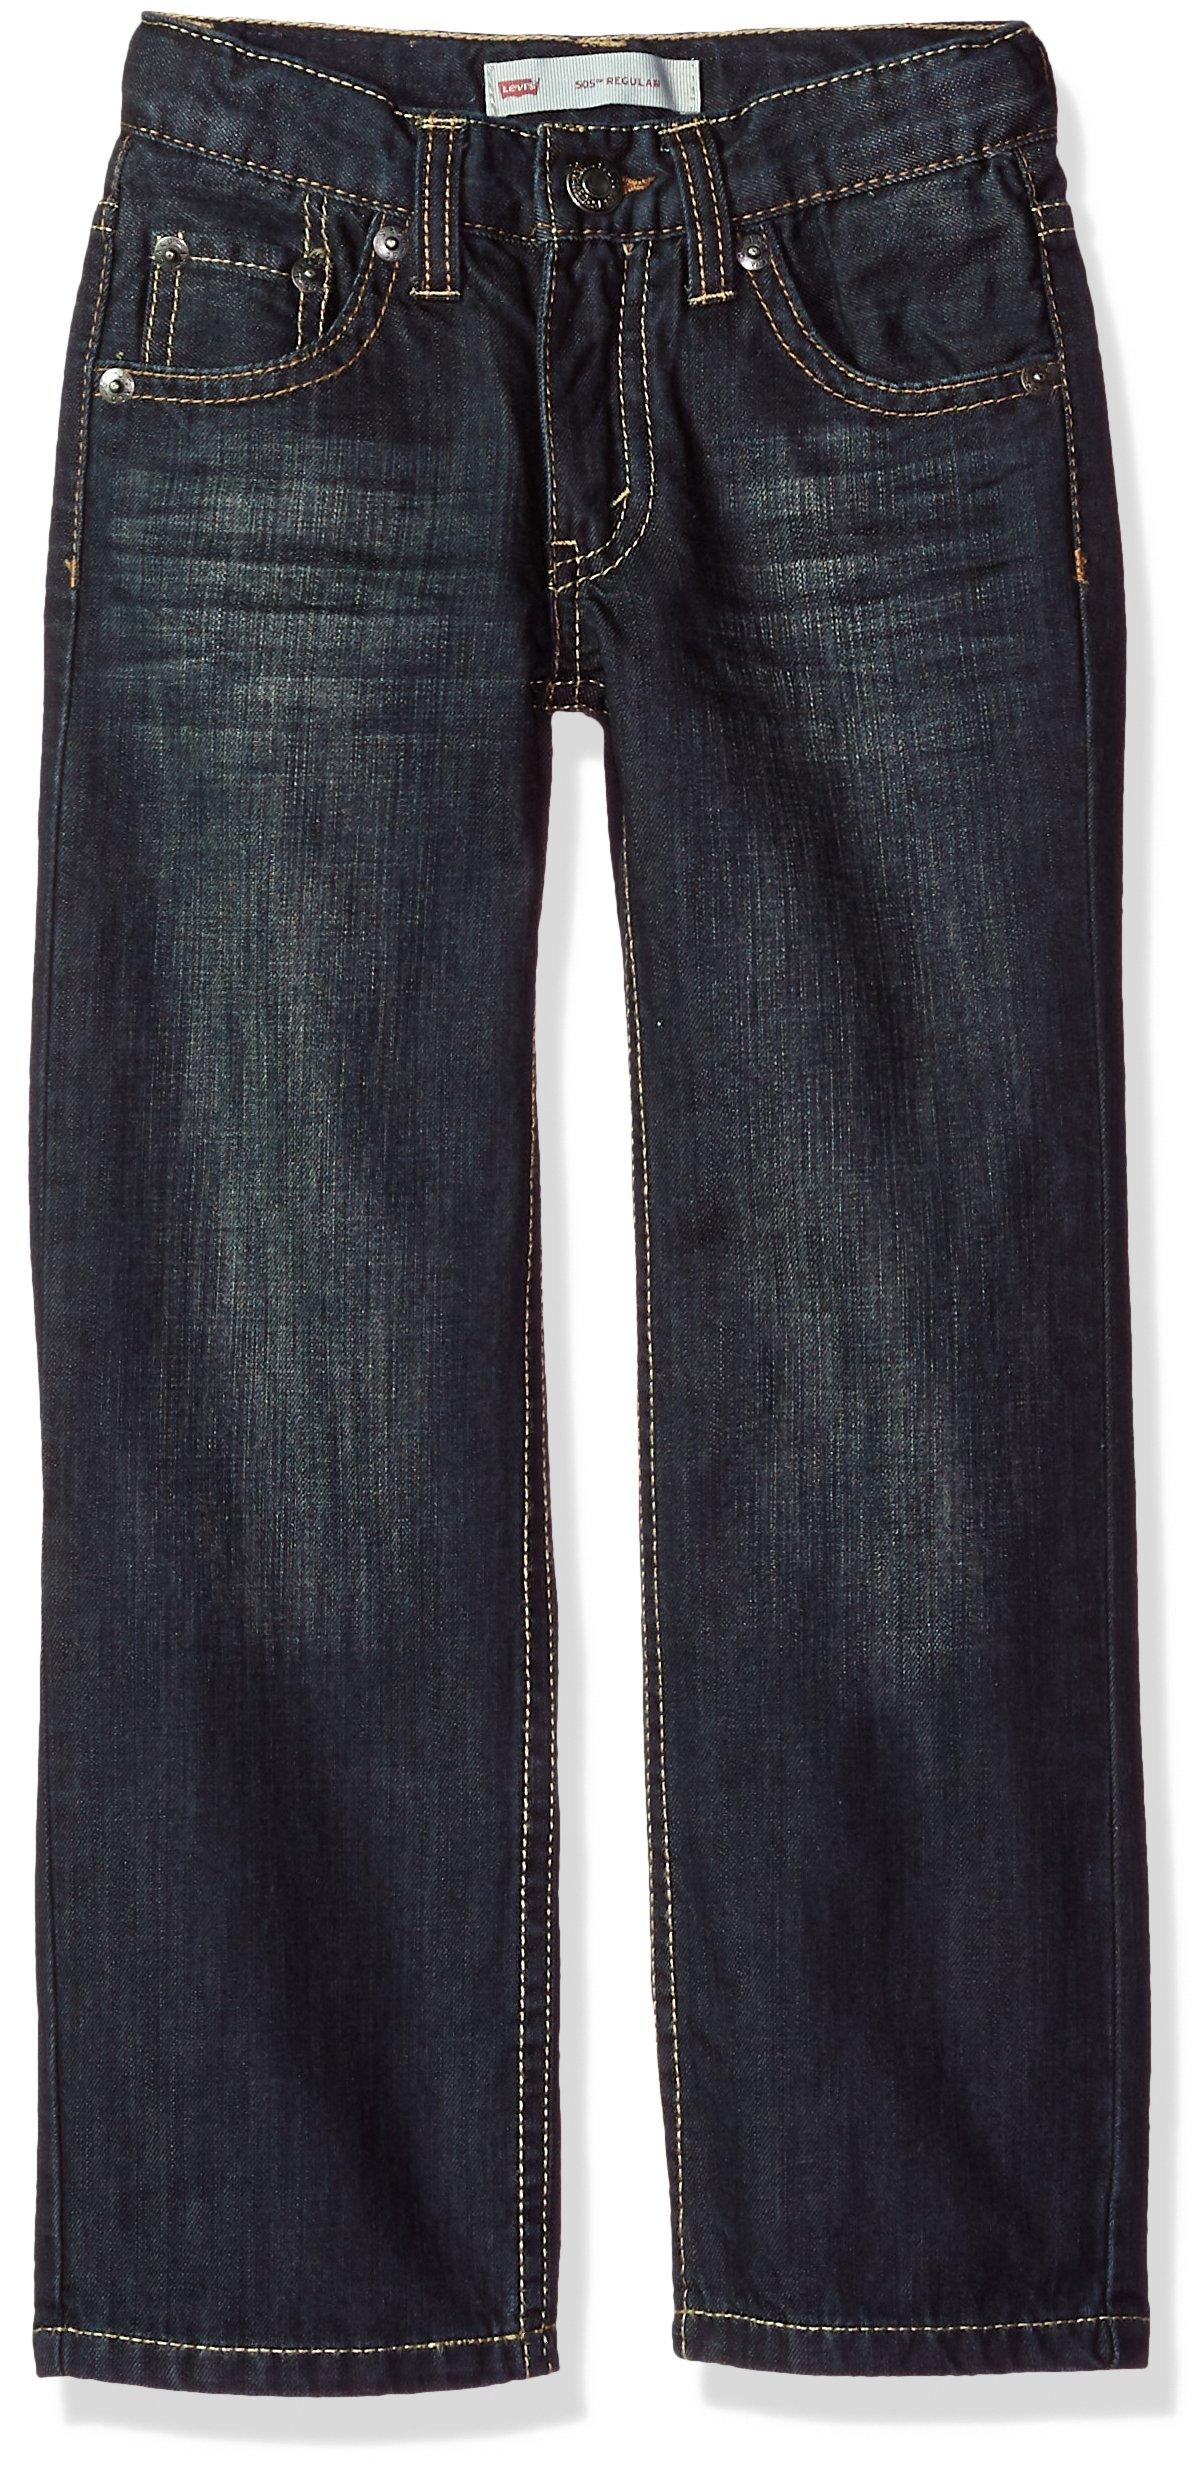 Levi's Boys' 505 Regular Fit Jeans, Dirt Road, 4 Slim